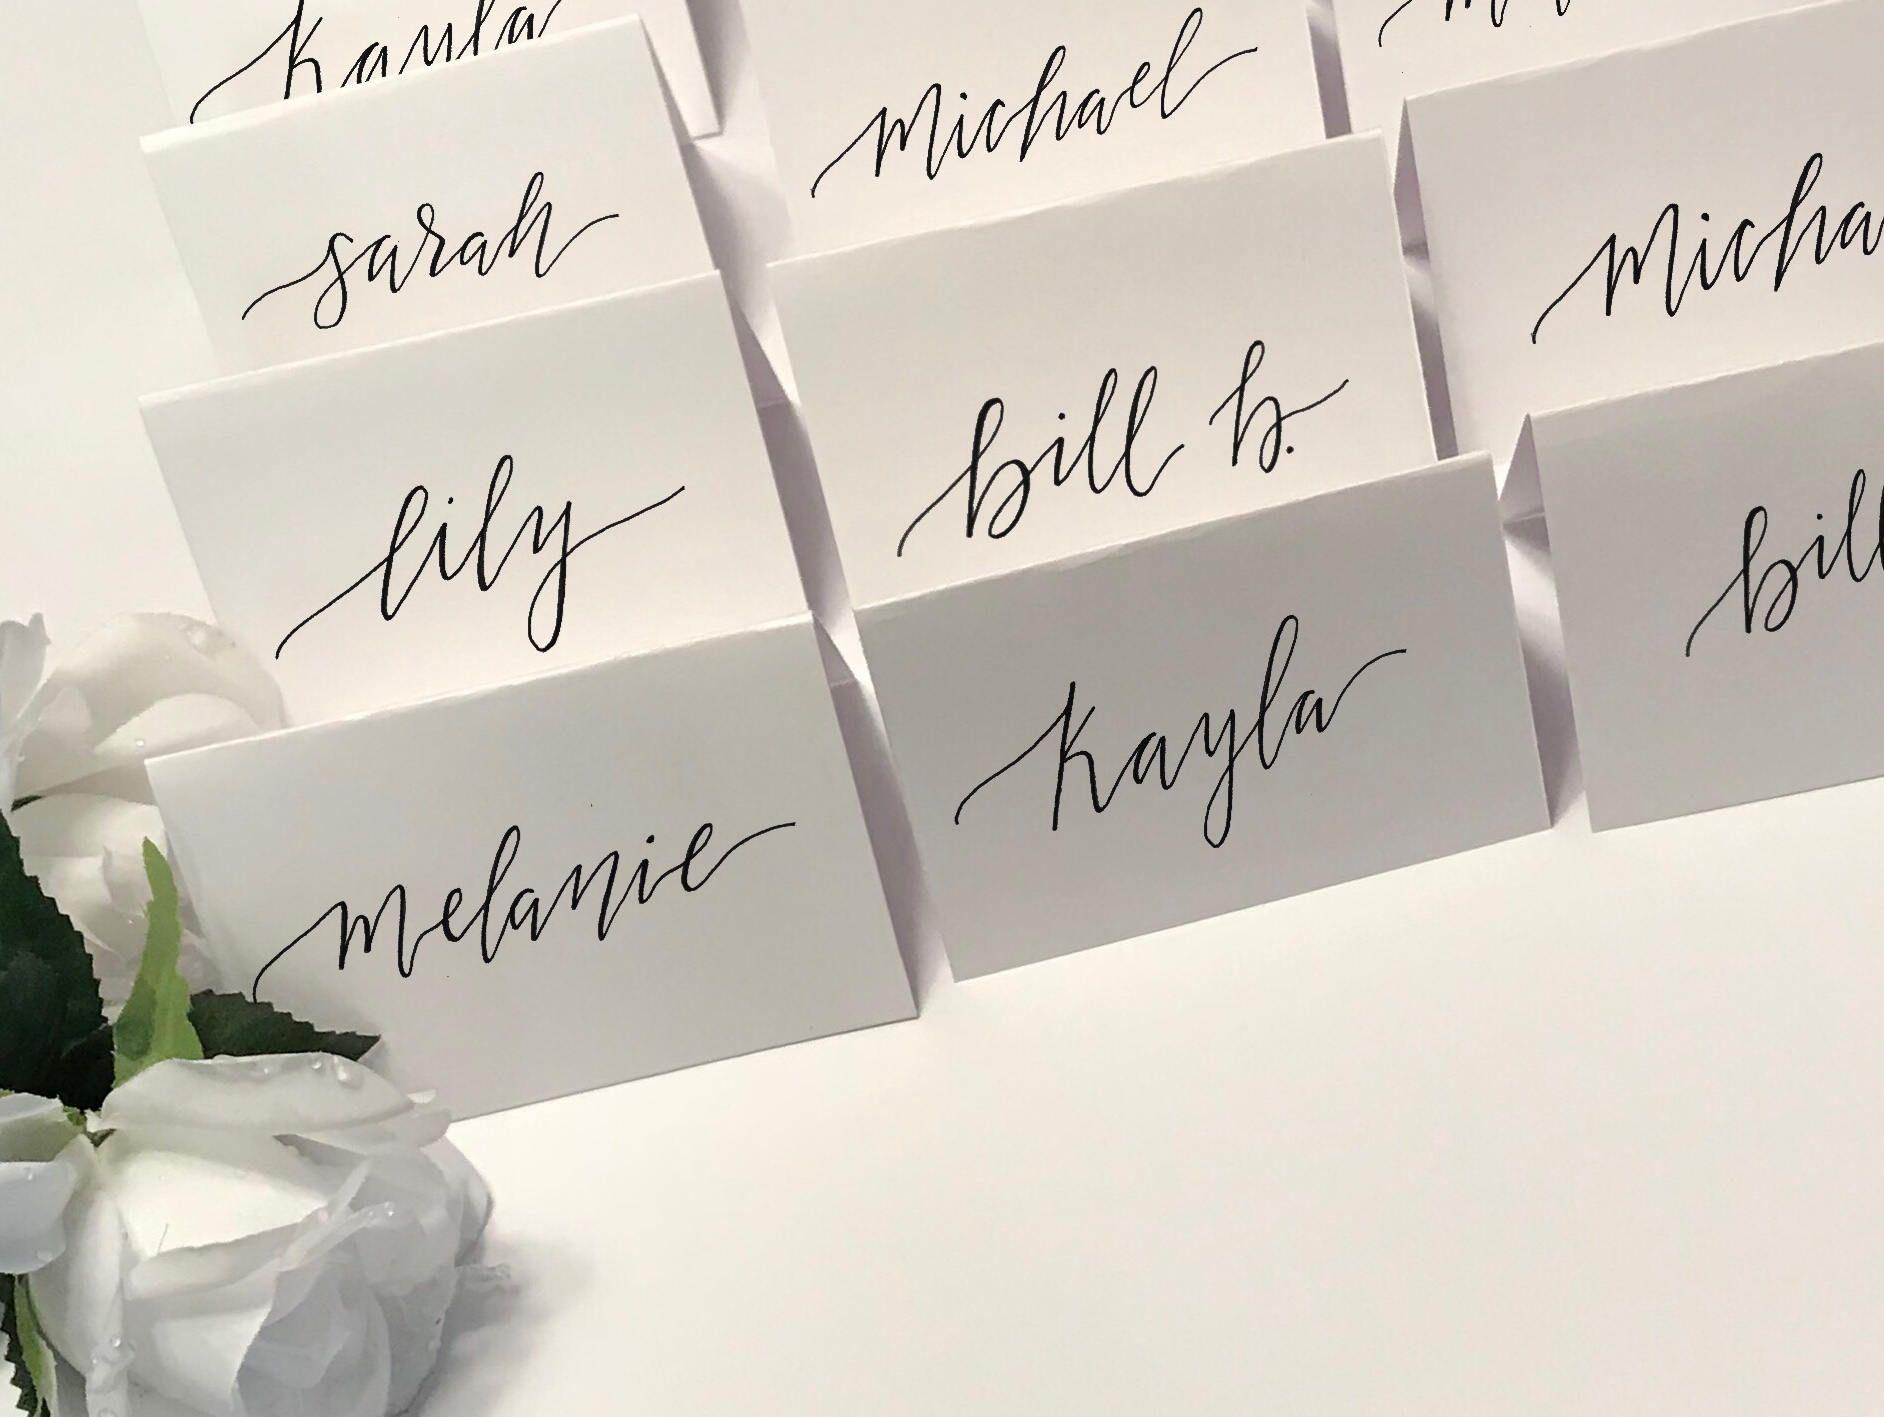 wedding name card calligraphy  wedding name cards